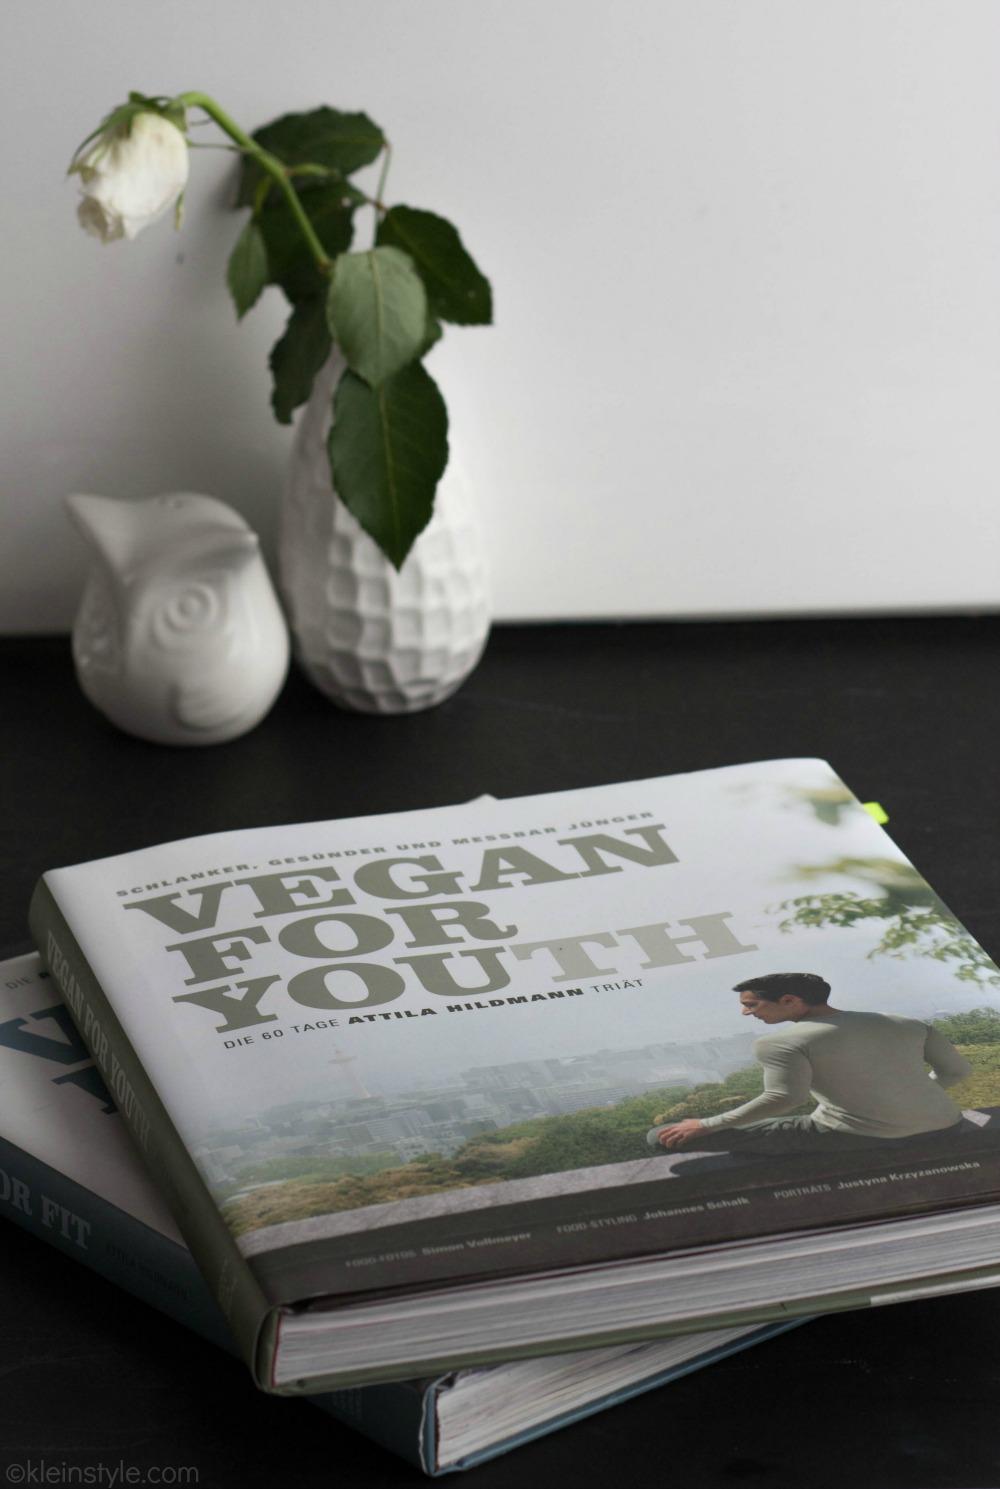 attila hildmann VEGAN FOR YOUTH Triaet -pic ©kleinstyle.com